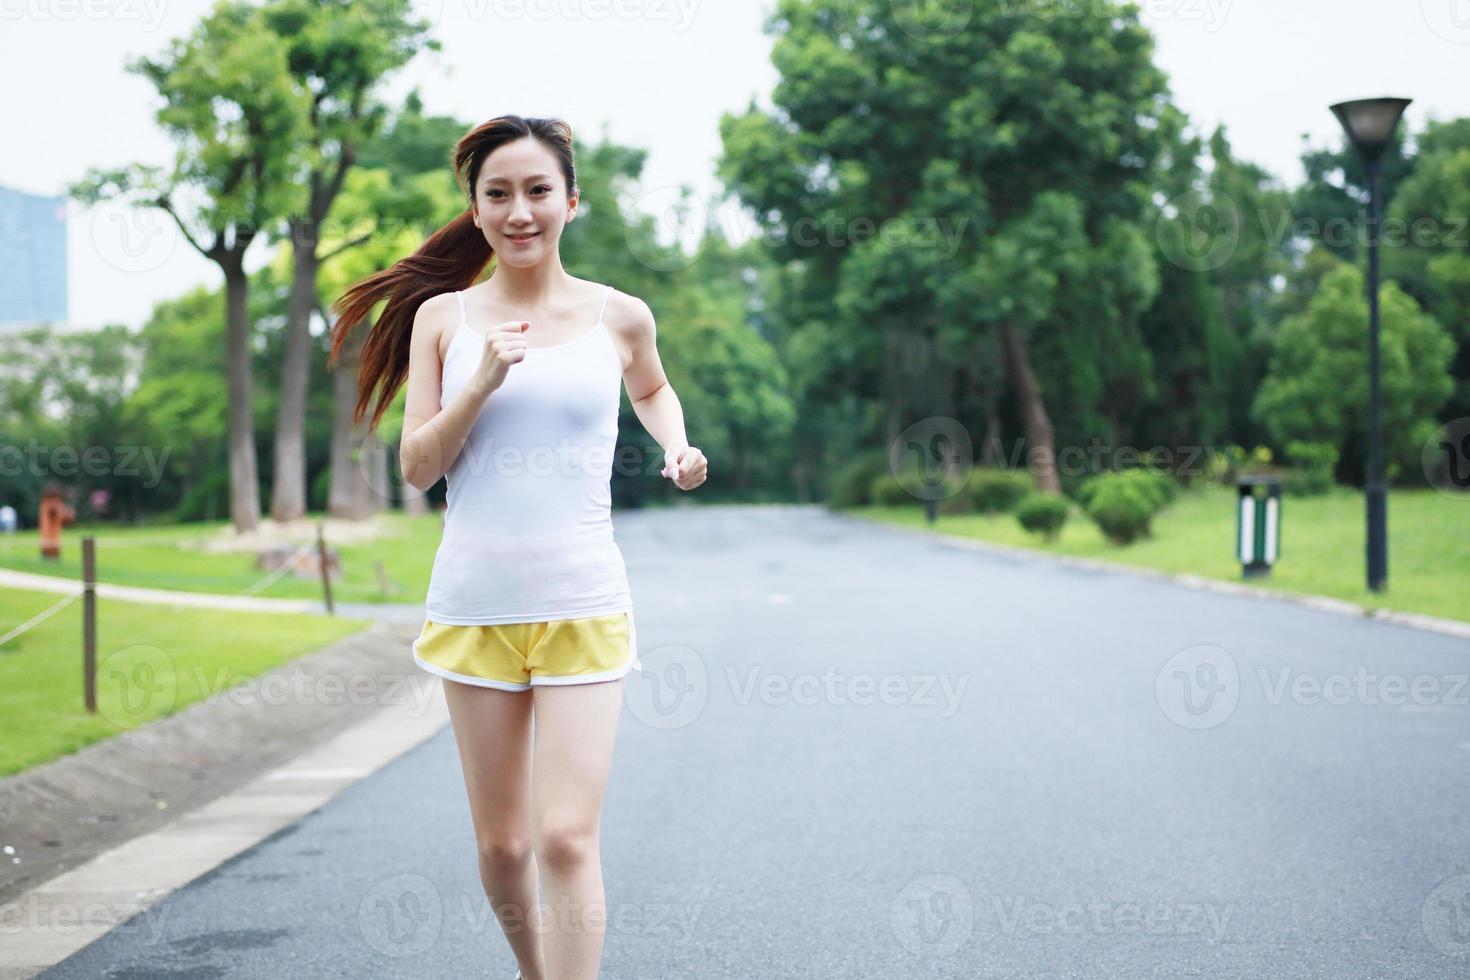 garota correndo foto